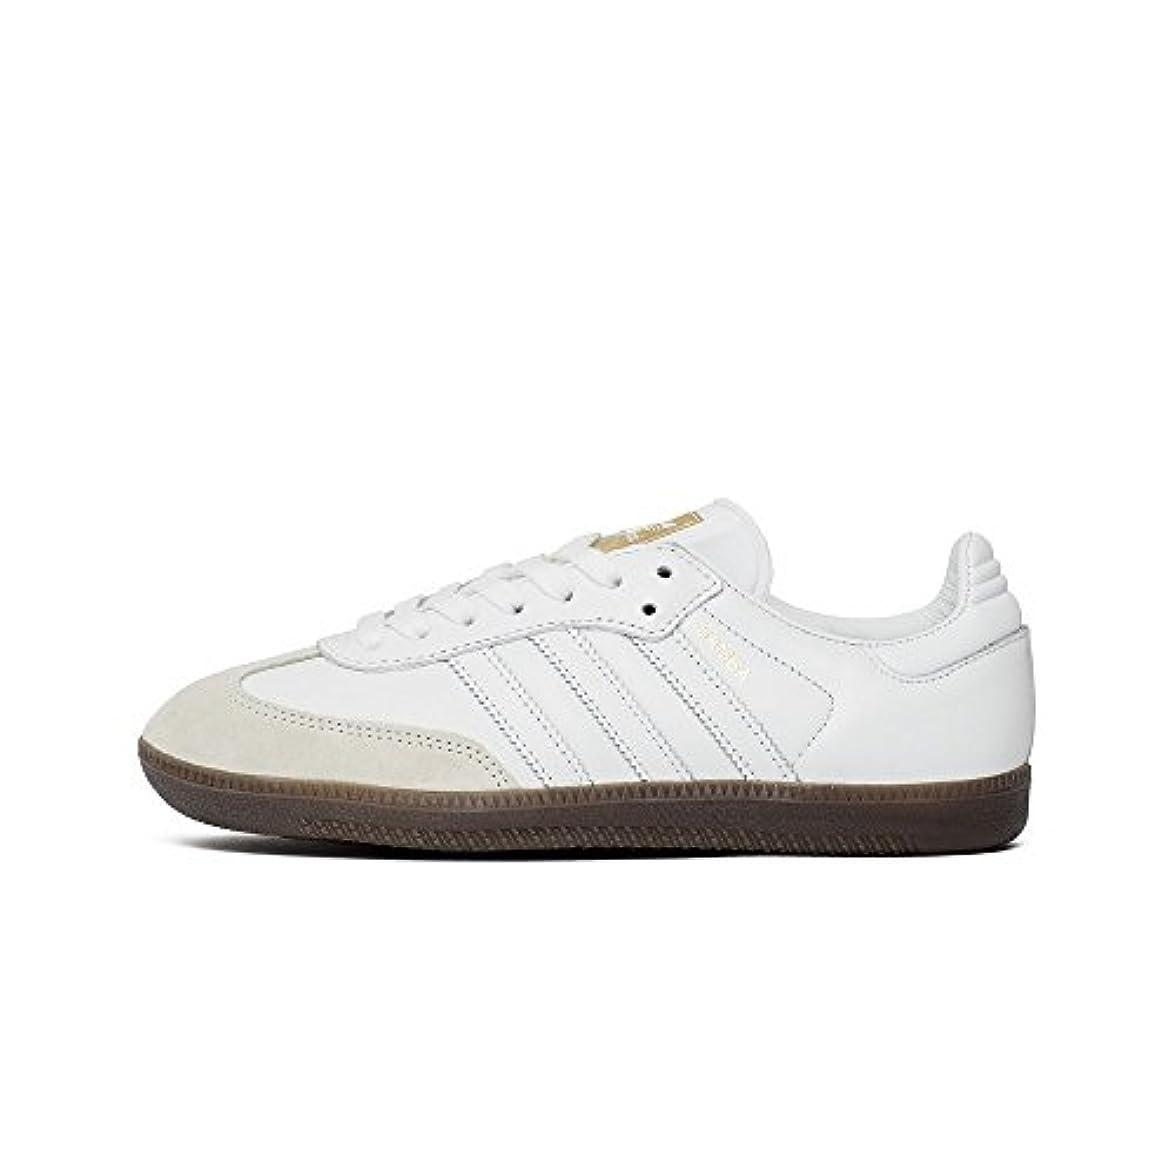 Adidas Samba Og W Scarpe Da Ginnastica Basse Donna